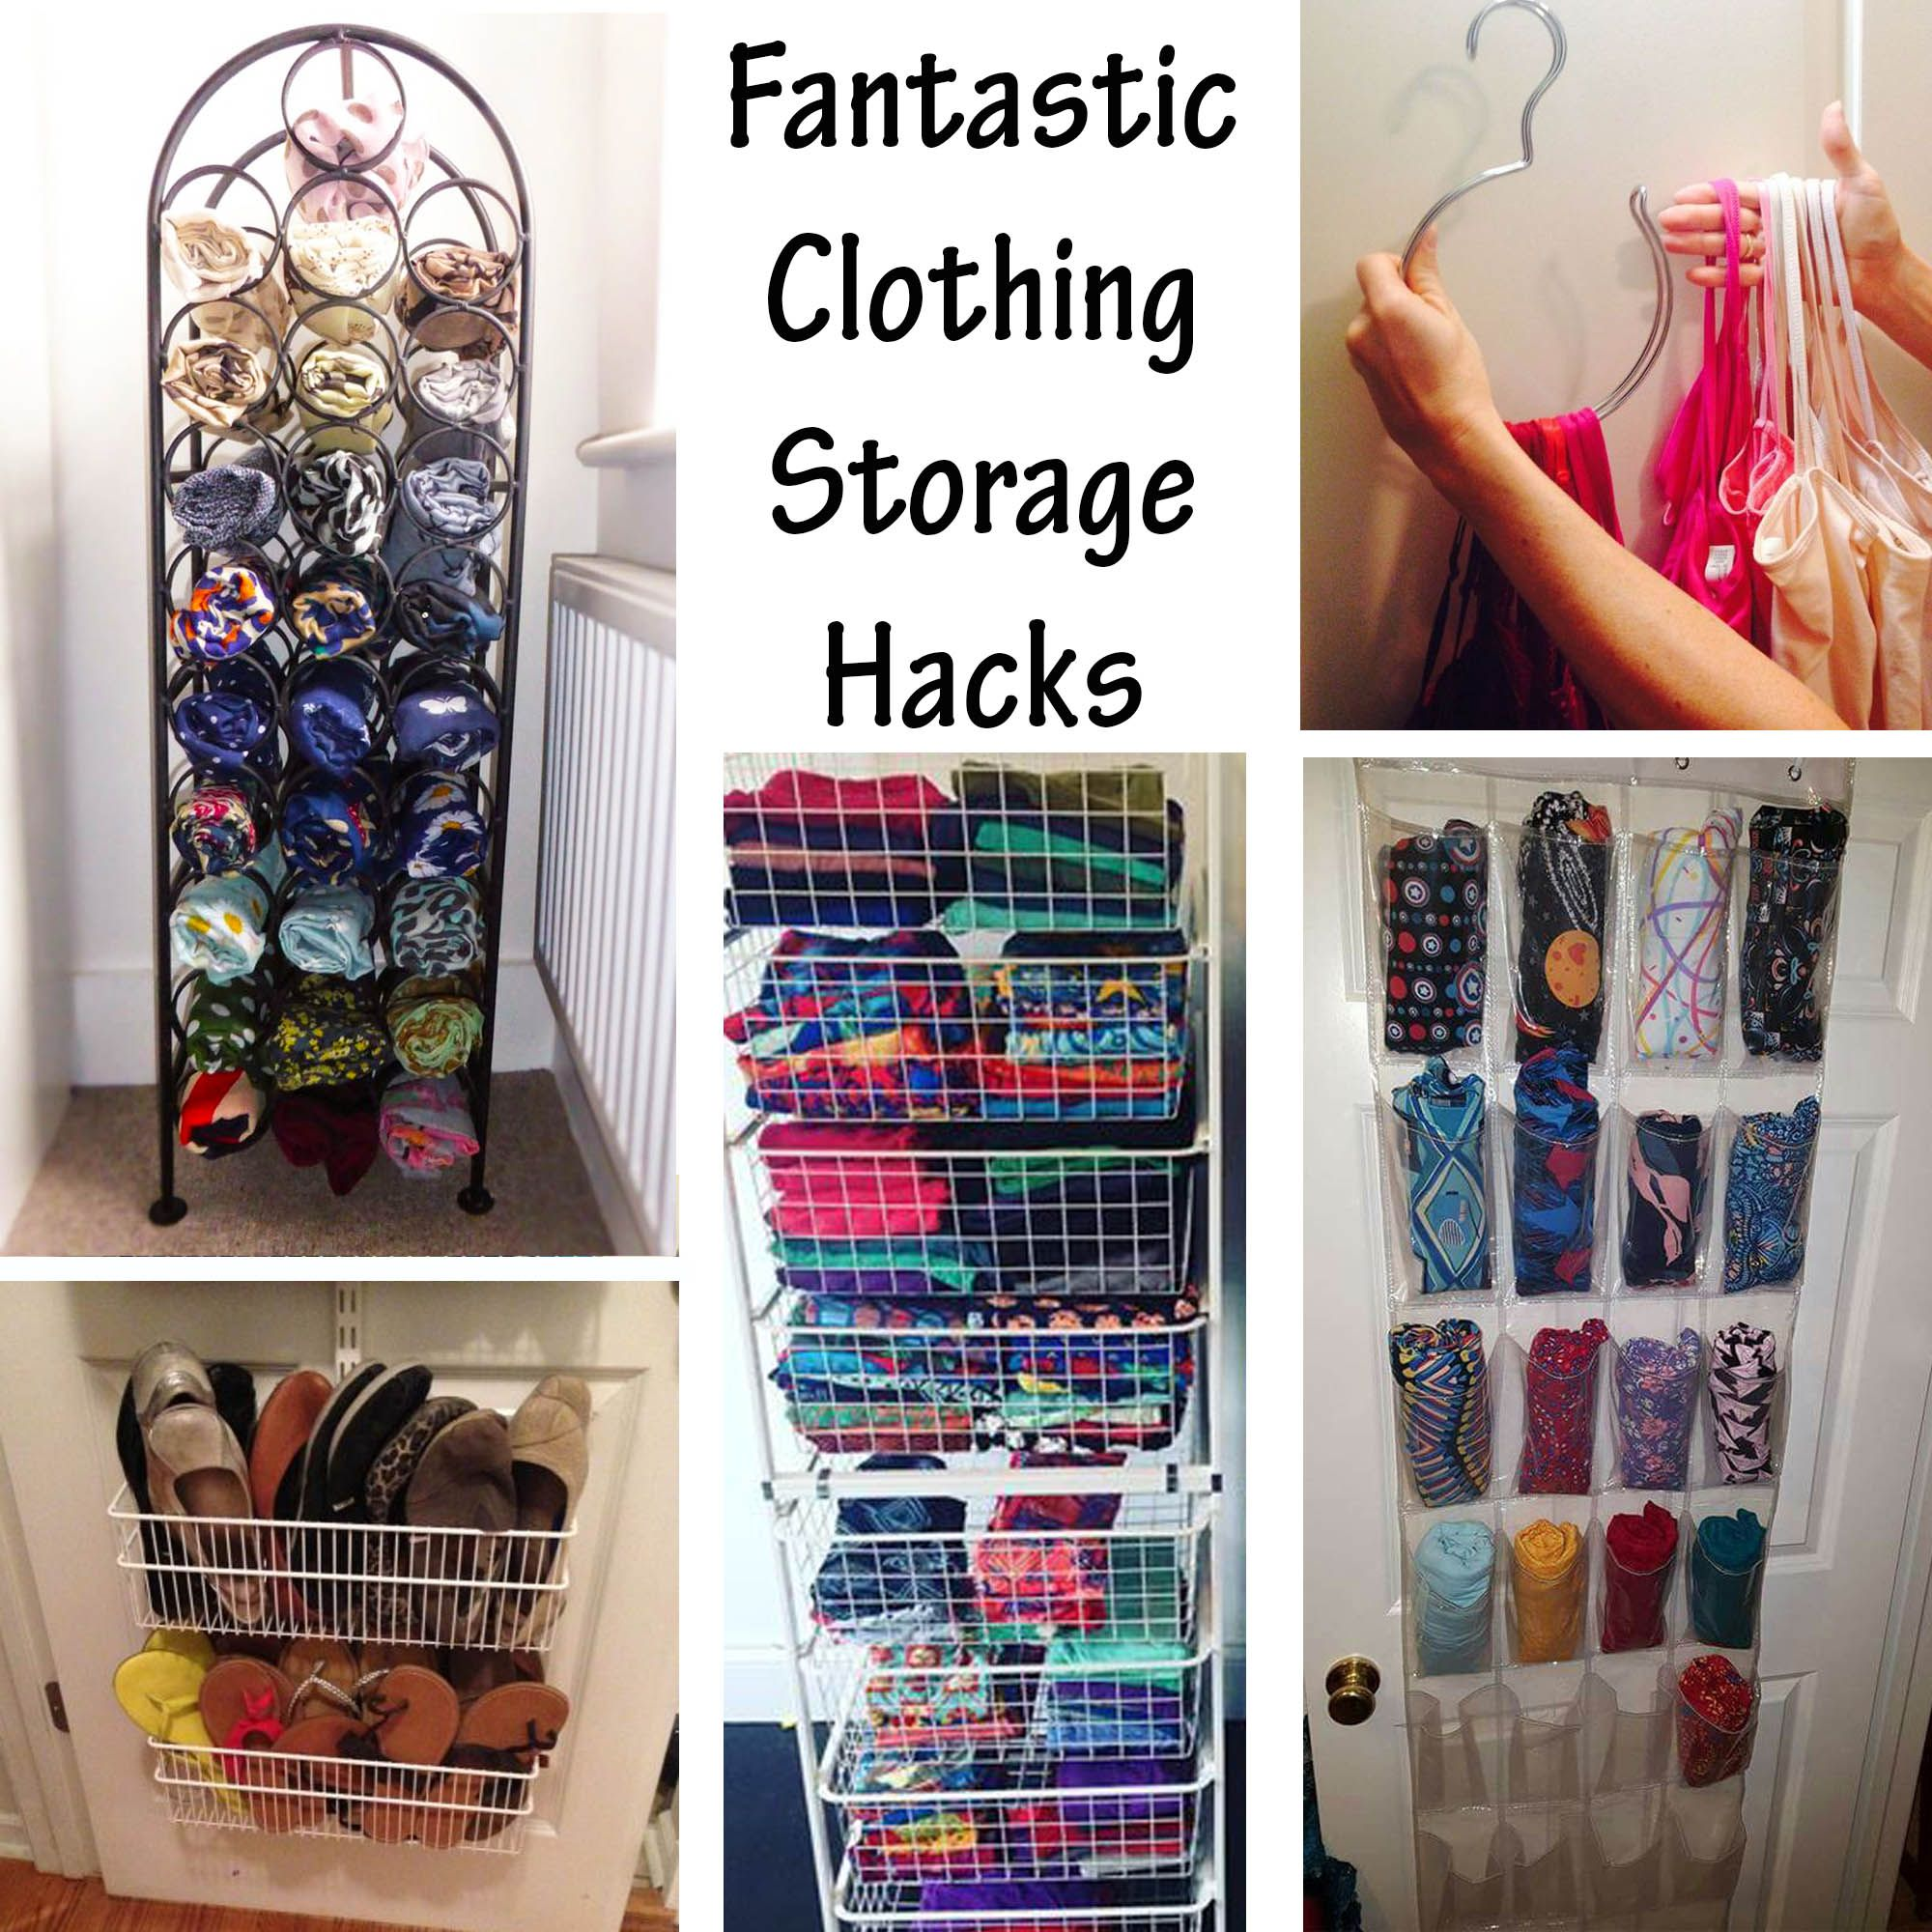 Fantastic Clothing Storage Hacks Bedroom Storage Ideas For